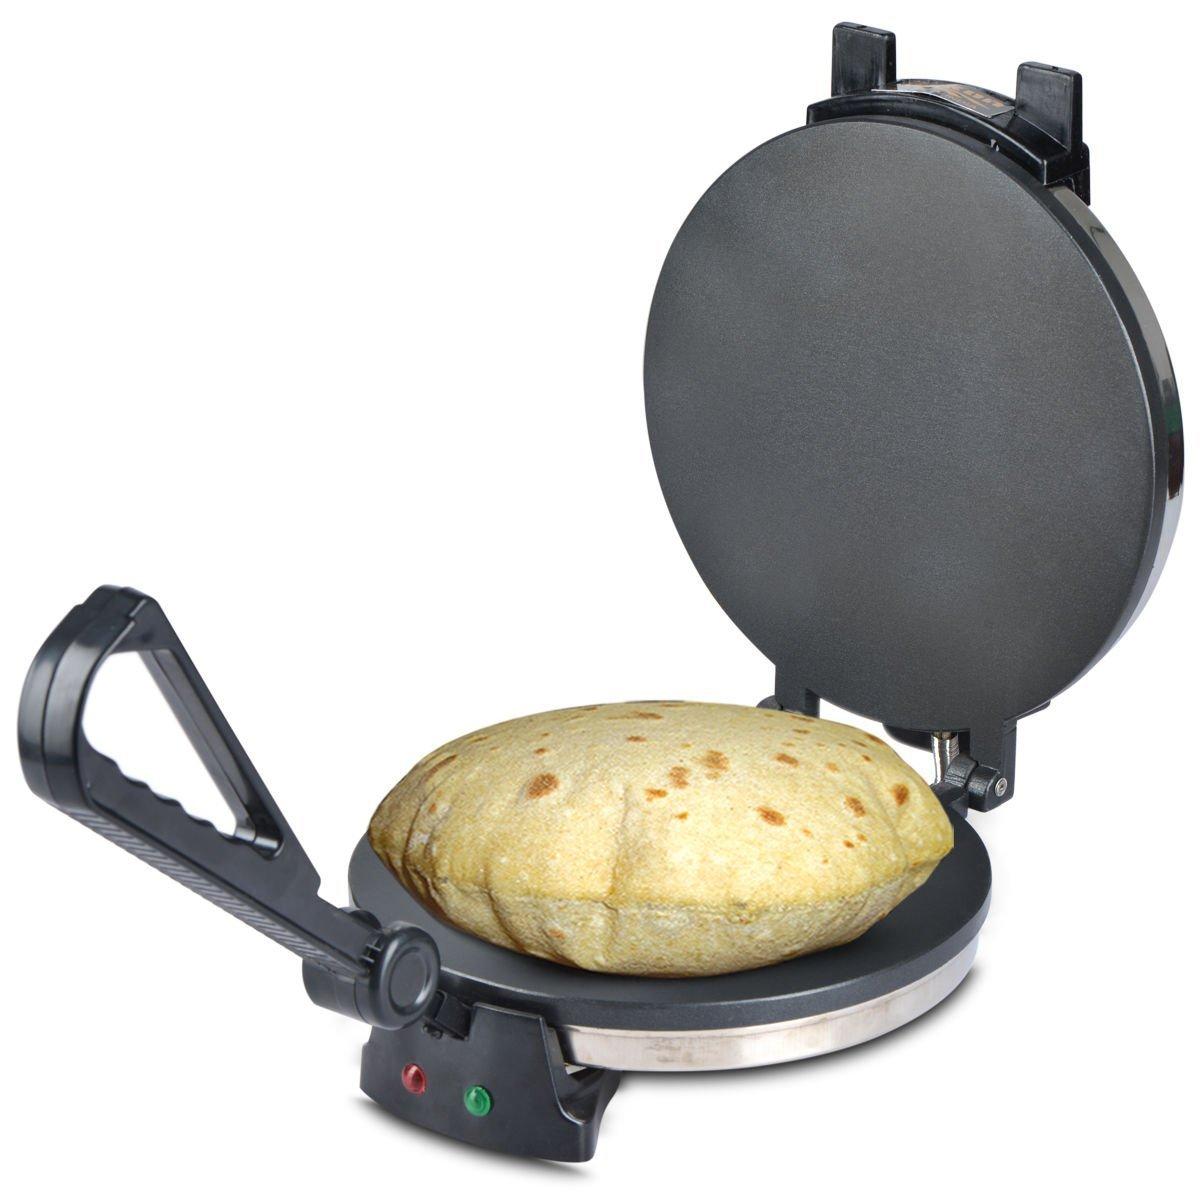 xodi-roti-maker-best-india-pic